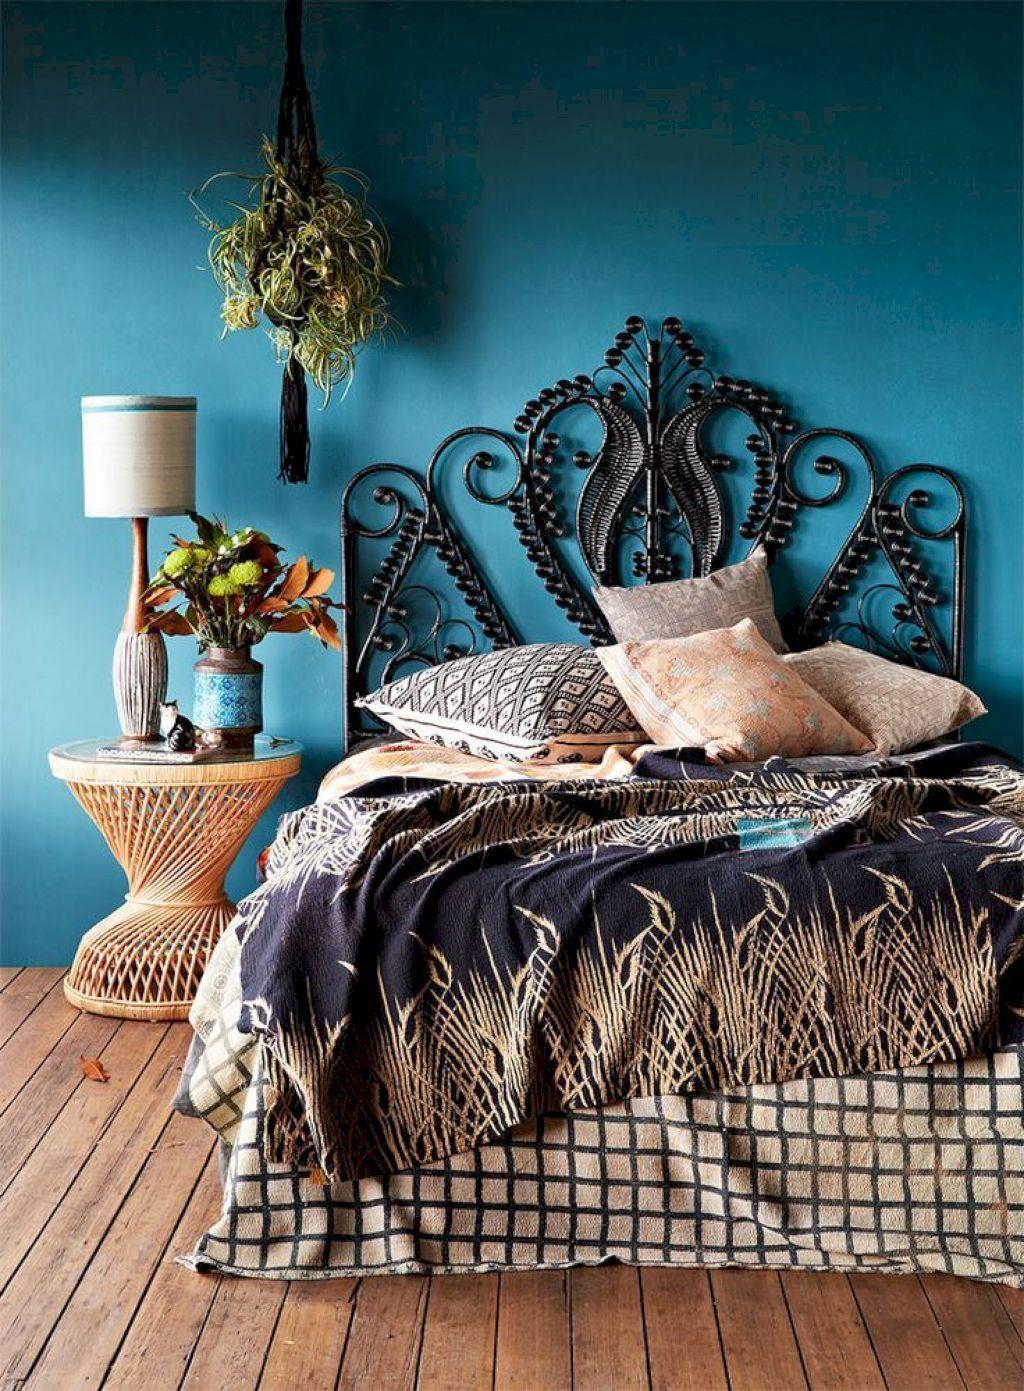 Inspiring Boho Style Home Decor Ideas 25: 06 Inspiring DIY Boho Chic Decor Ideas On A Budget In 2019